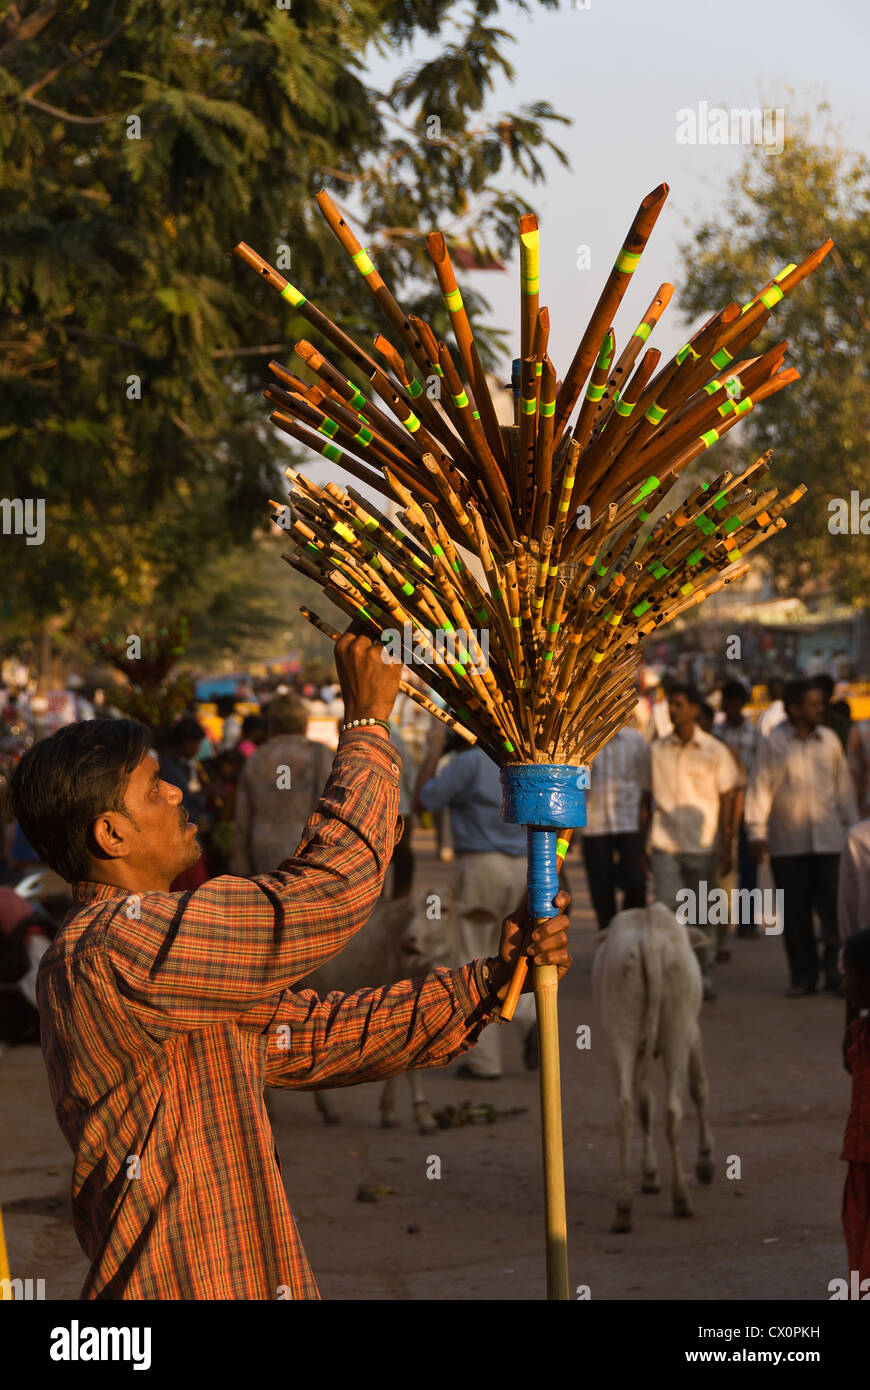 Elk201-2520v India, Karnataka, Hampi, Hampi Bazaar, man selling flutes - Stock Image